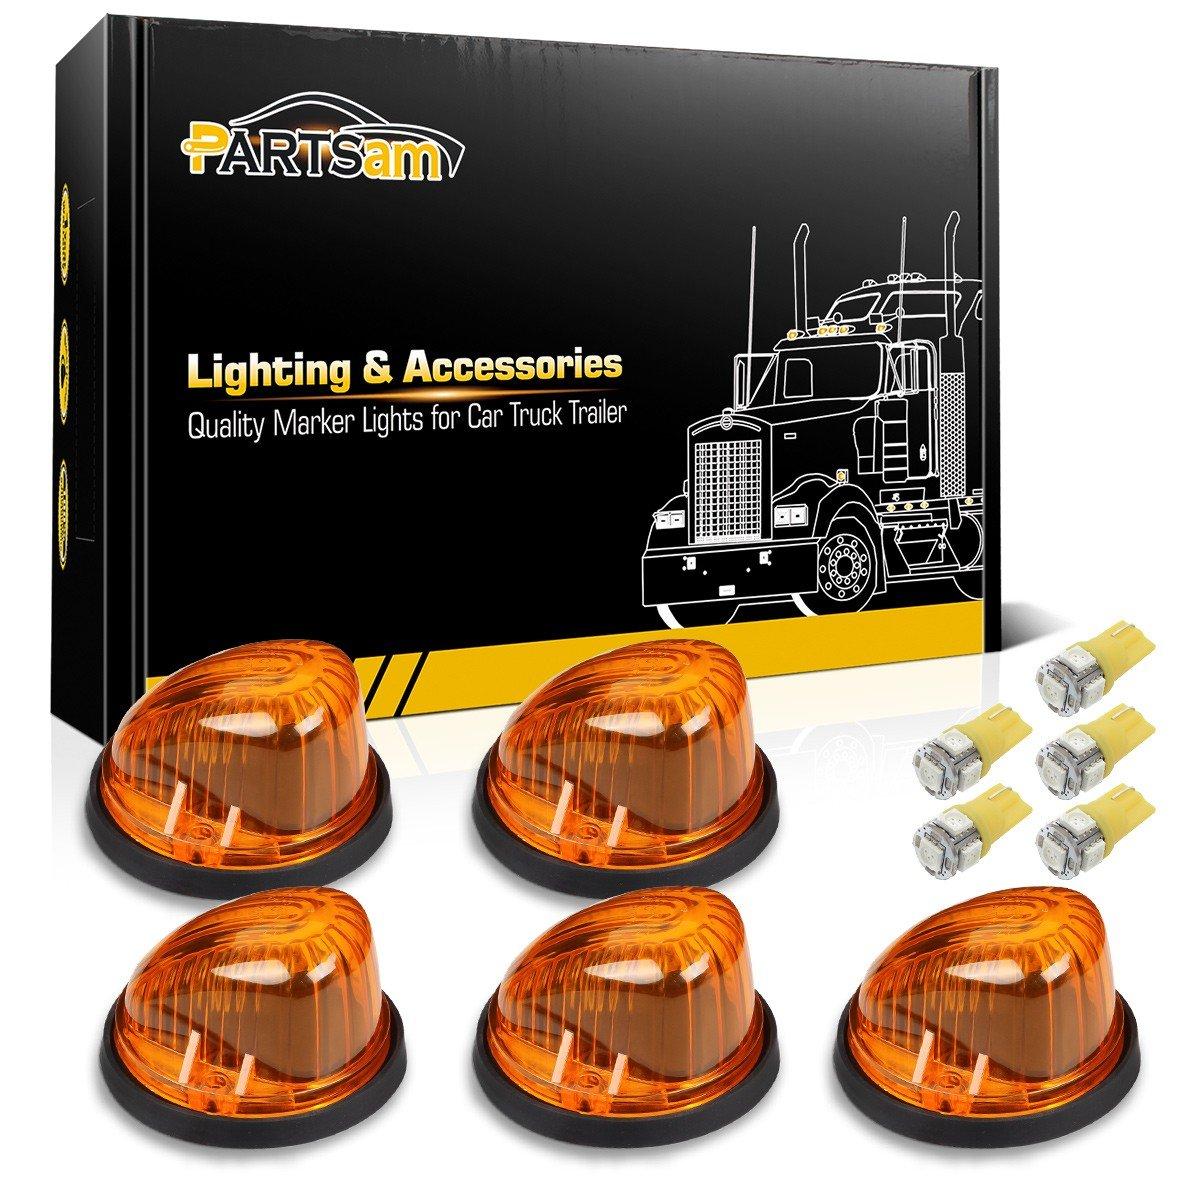 Partsam 5X Cab Marker Light Marker 1313A Amber Lens + 5X Amber T10 LED Bulbs + Base Compatible with Chevrolet/GMC/Dually Suburban Blazer C1500 C2500 C3500 K1500 K2500 K3500 1969-1987 Pickup Trucks